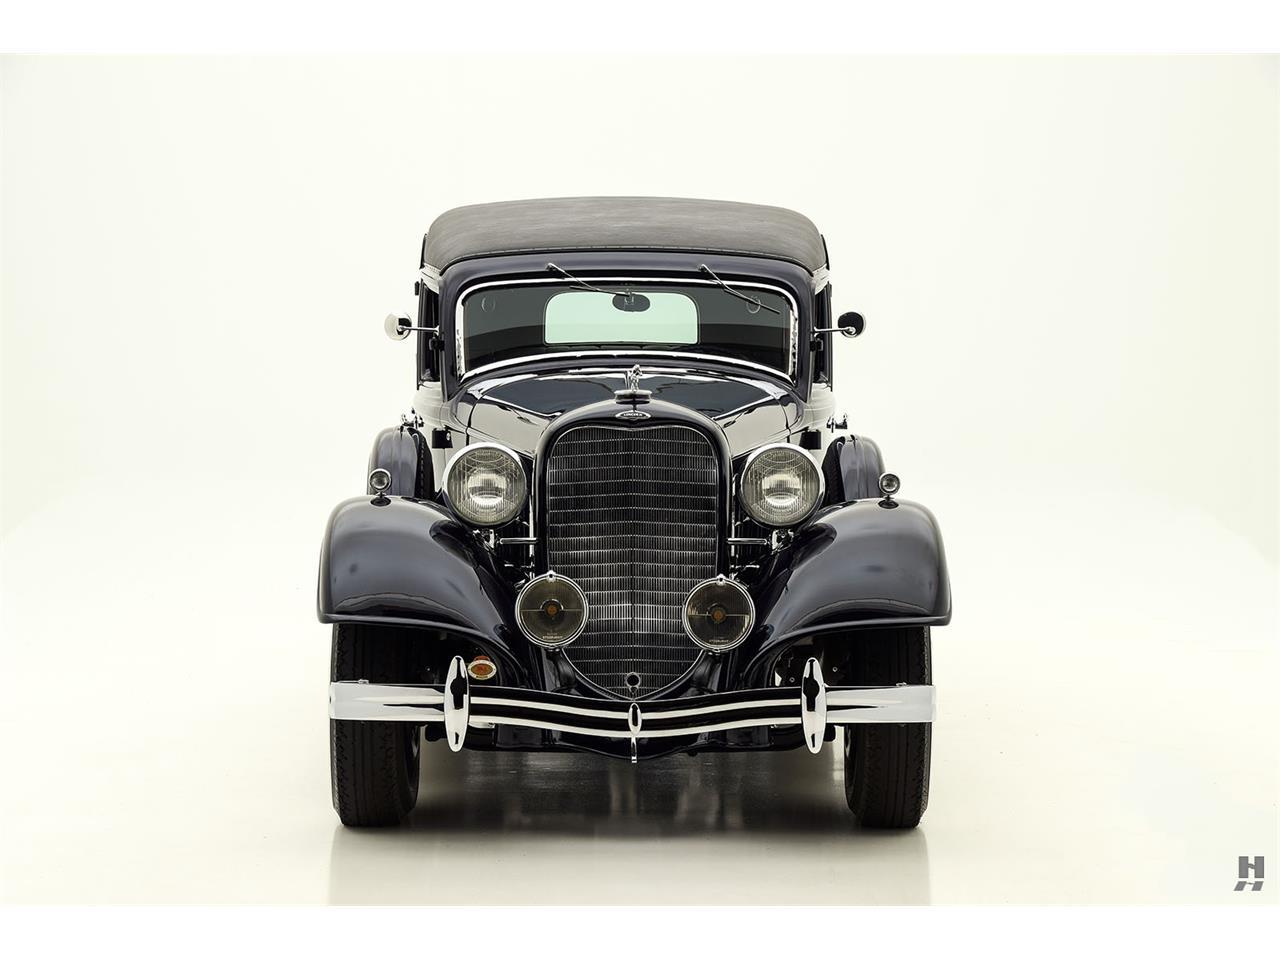 Large Picture of 1934 Antique - $129,500.00 - LBT2